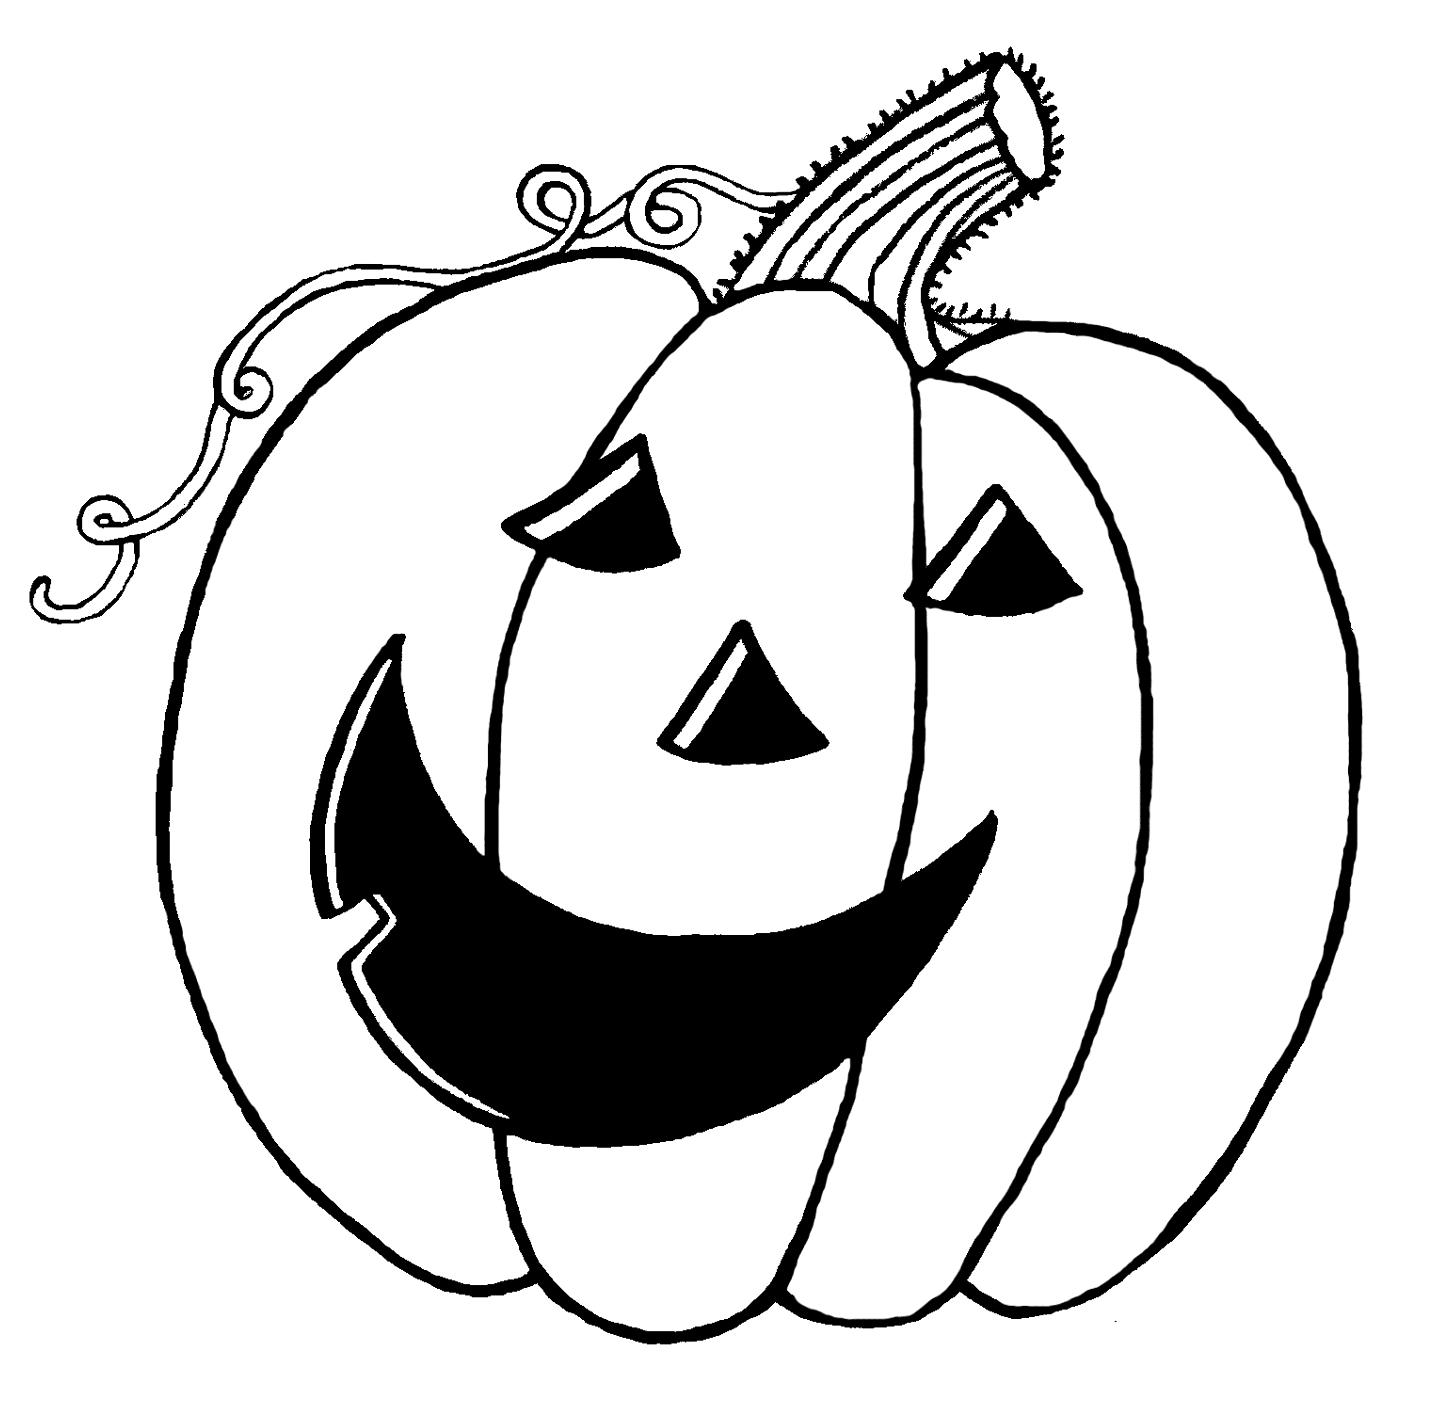 Happy jack o lantern clipart black and white clip art download Jack O Lantern Drawing | Free download best Jack O Lantern Drawing ... clip art download